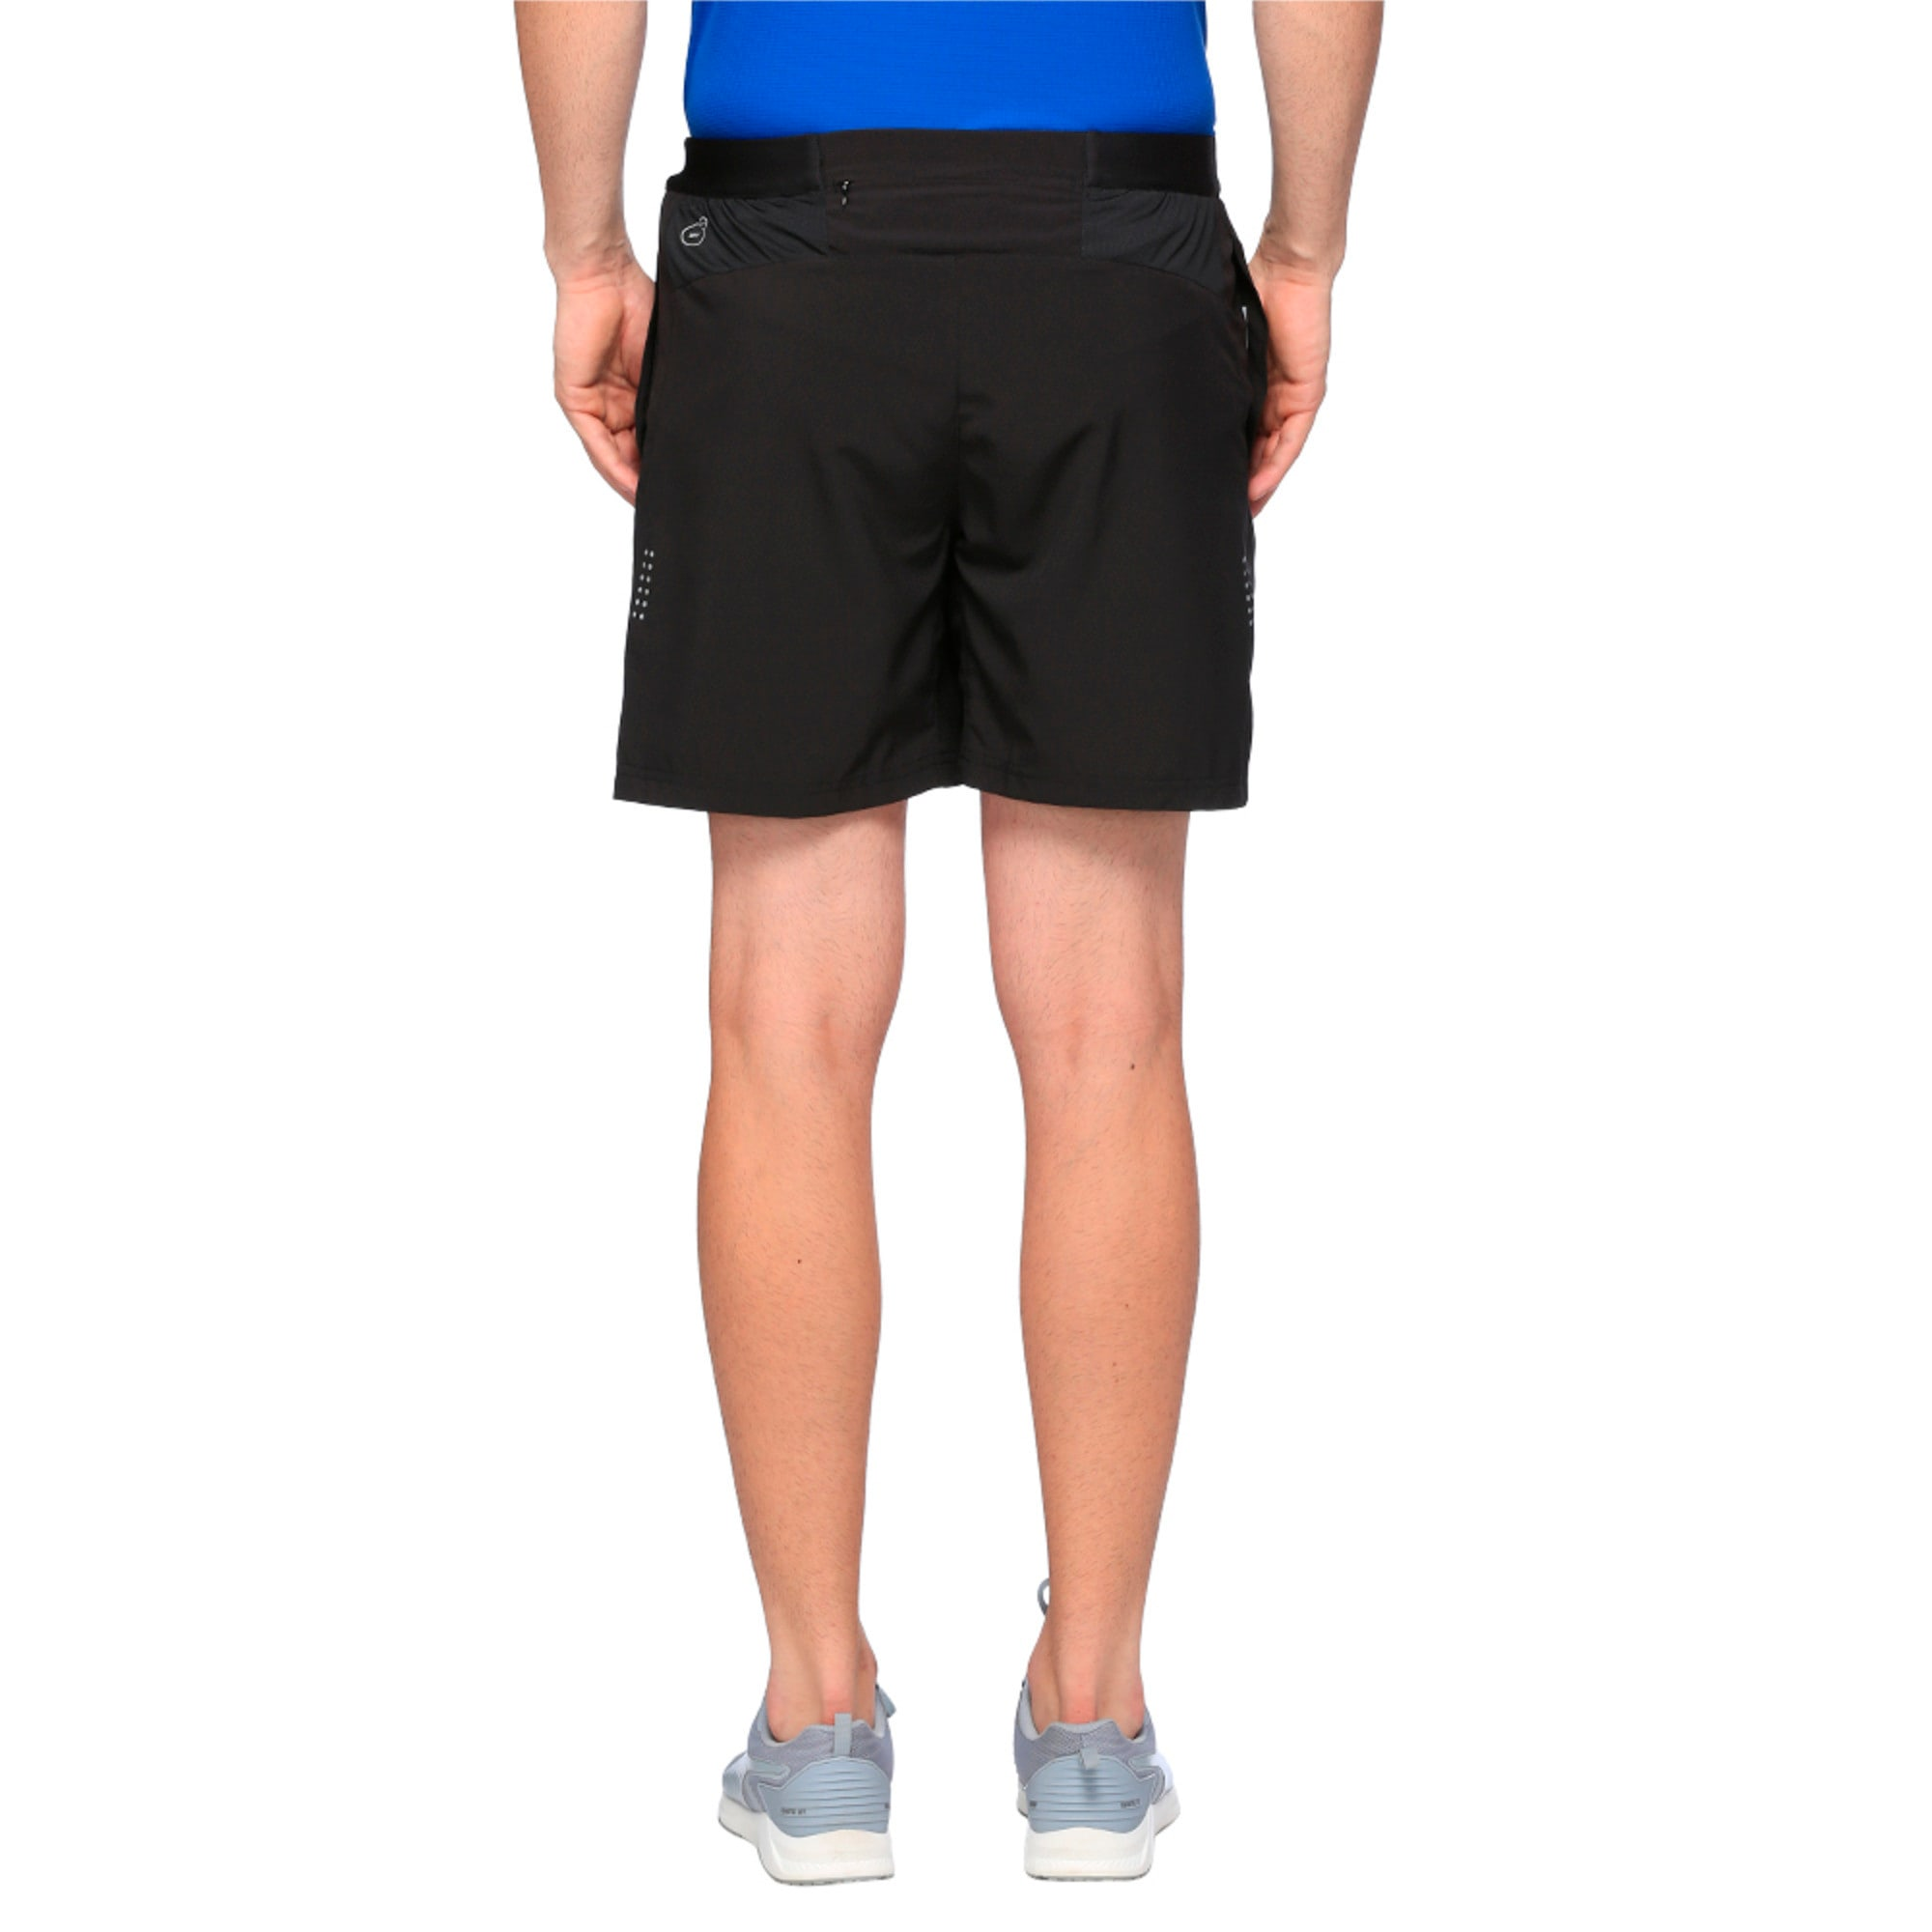 Thumbnail 2 of Running Men's Pace Shorts, Puma Black, medium-IND